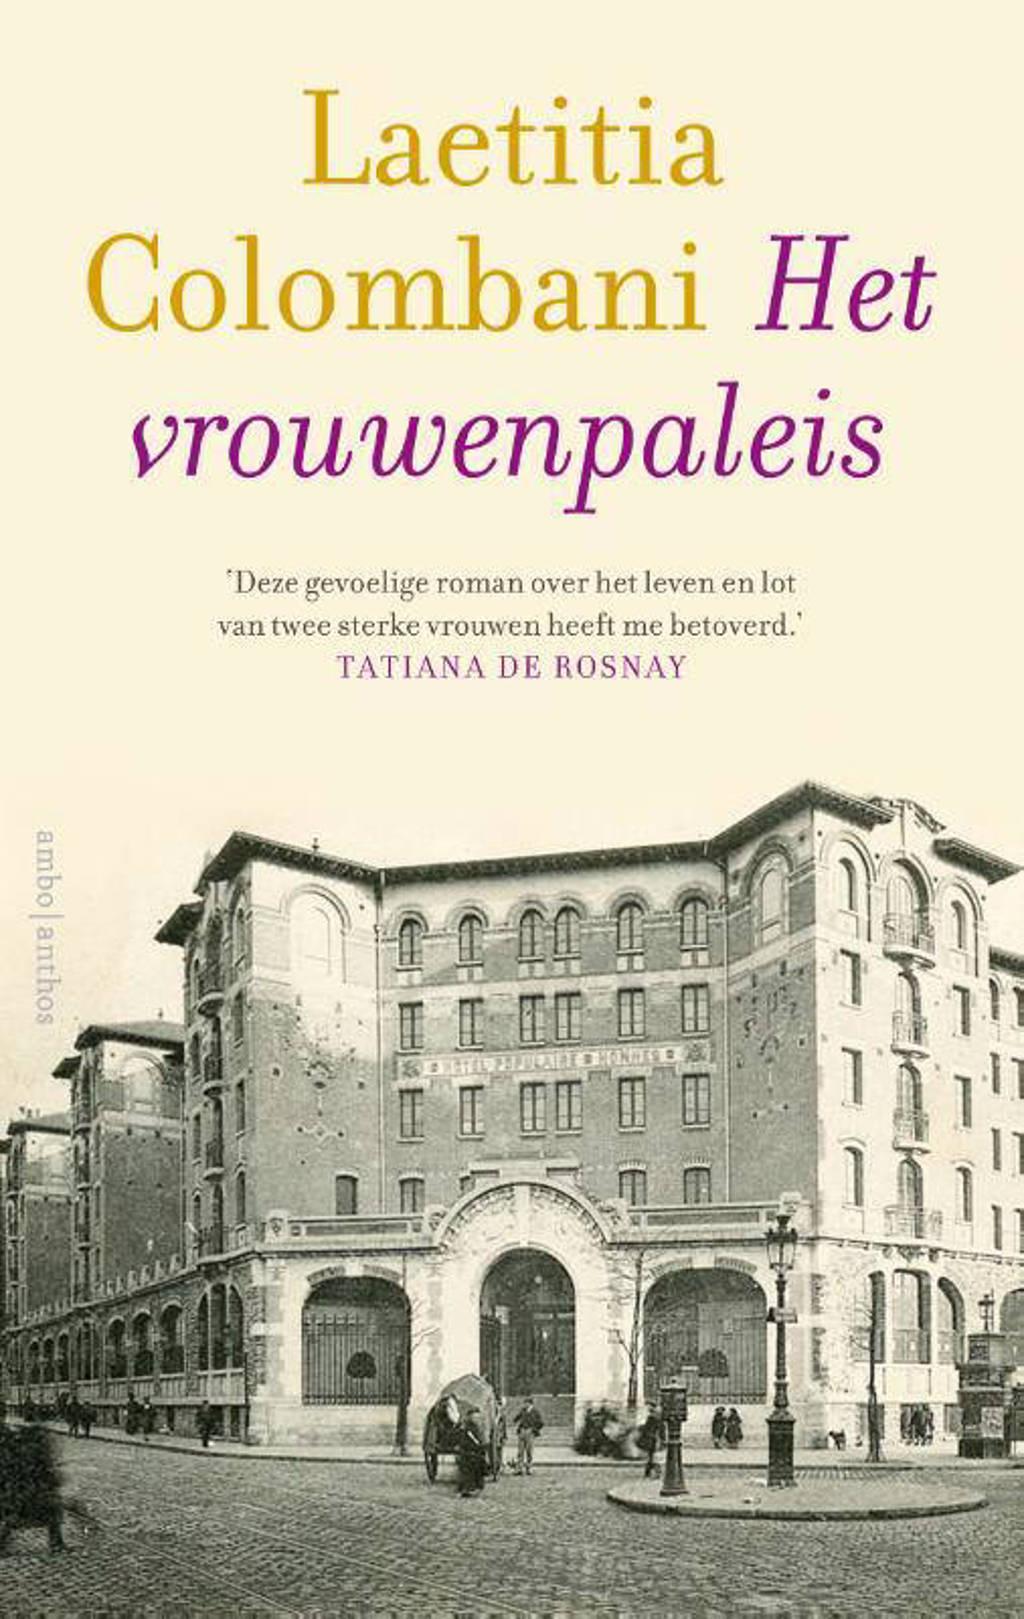 Het vrouwenpaleis - Laetitia Colombani